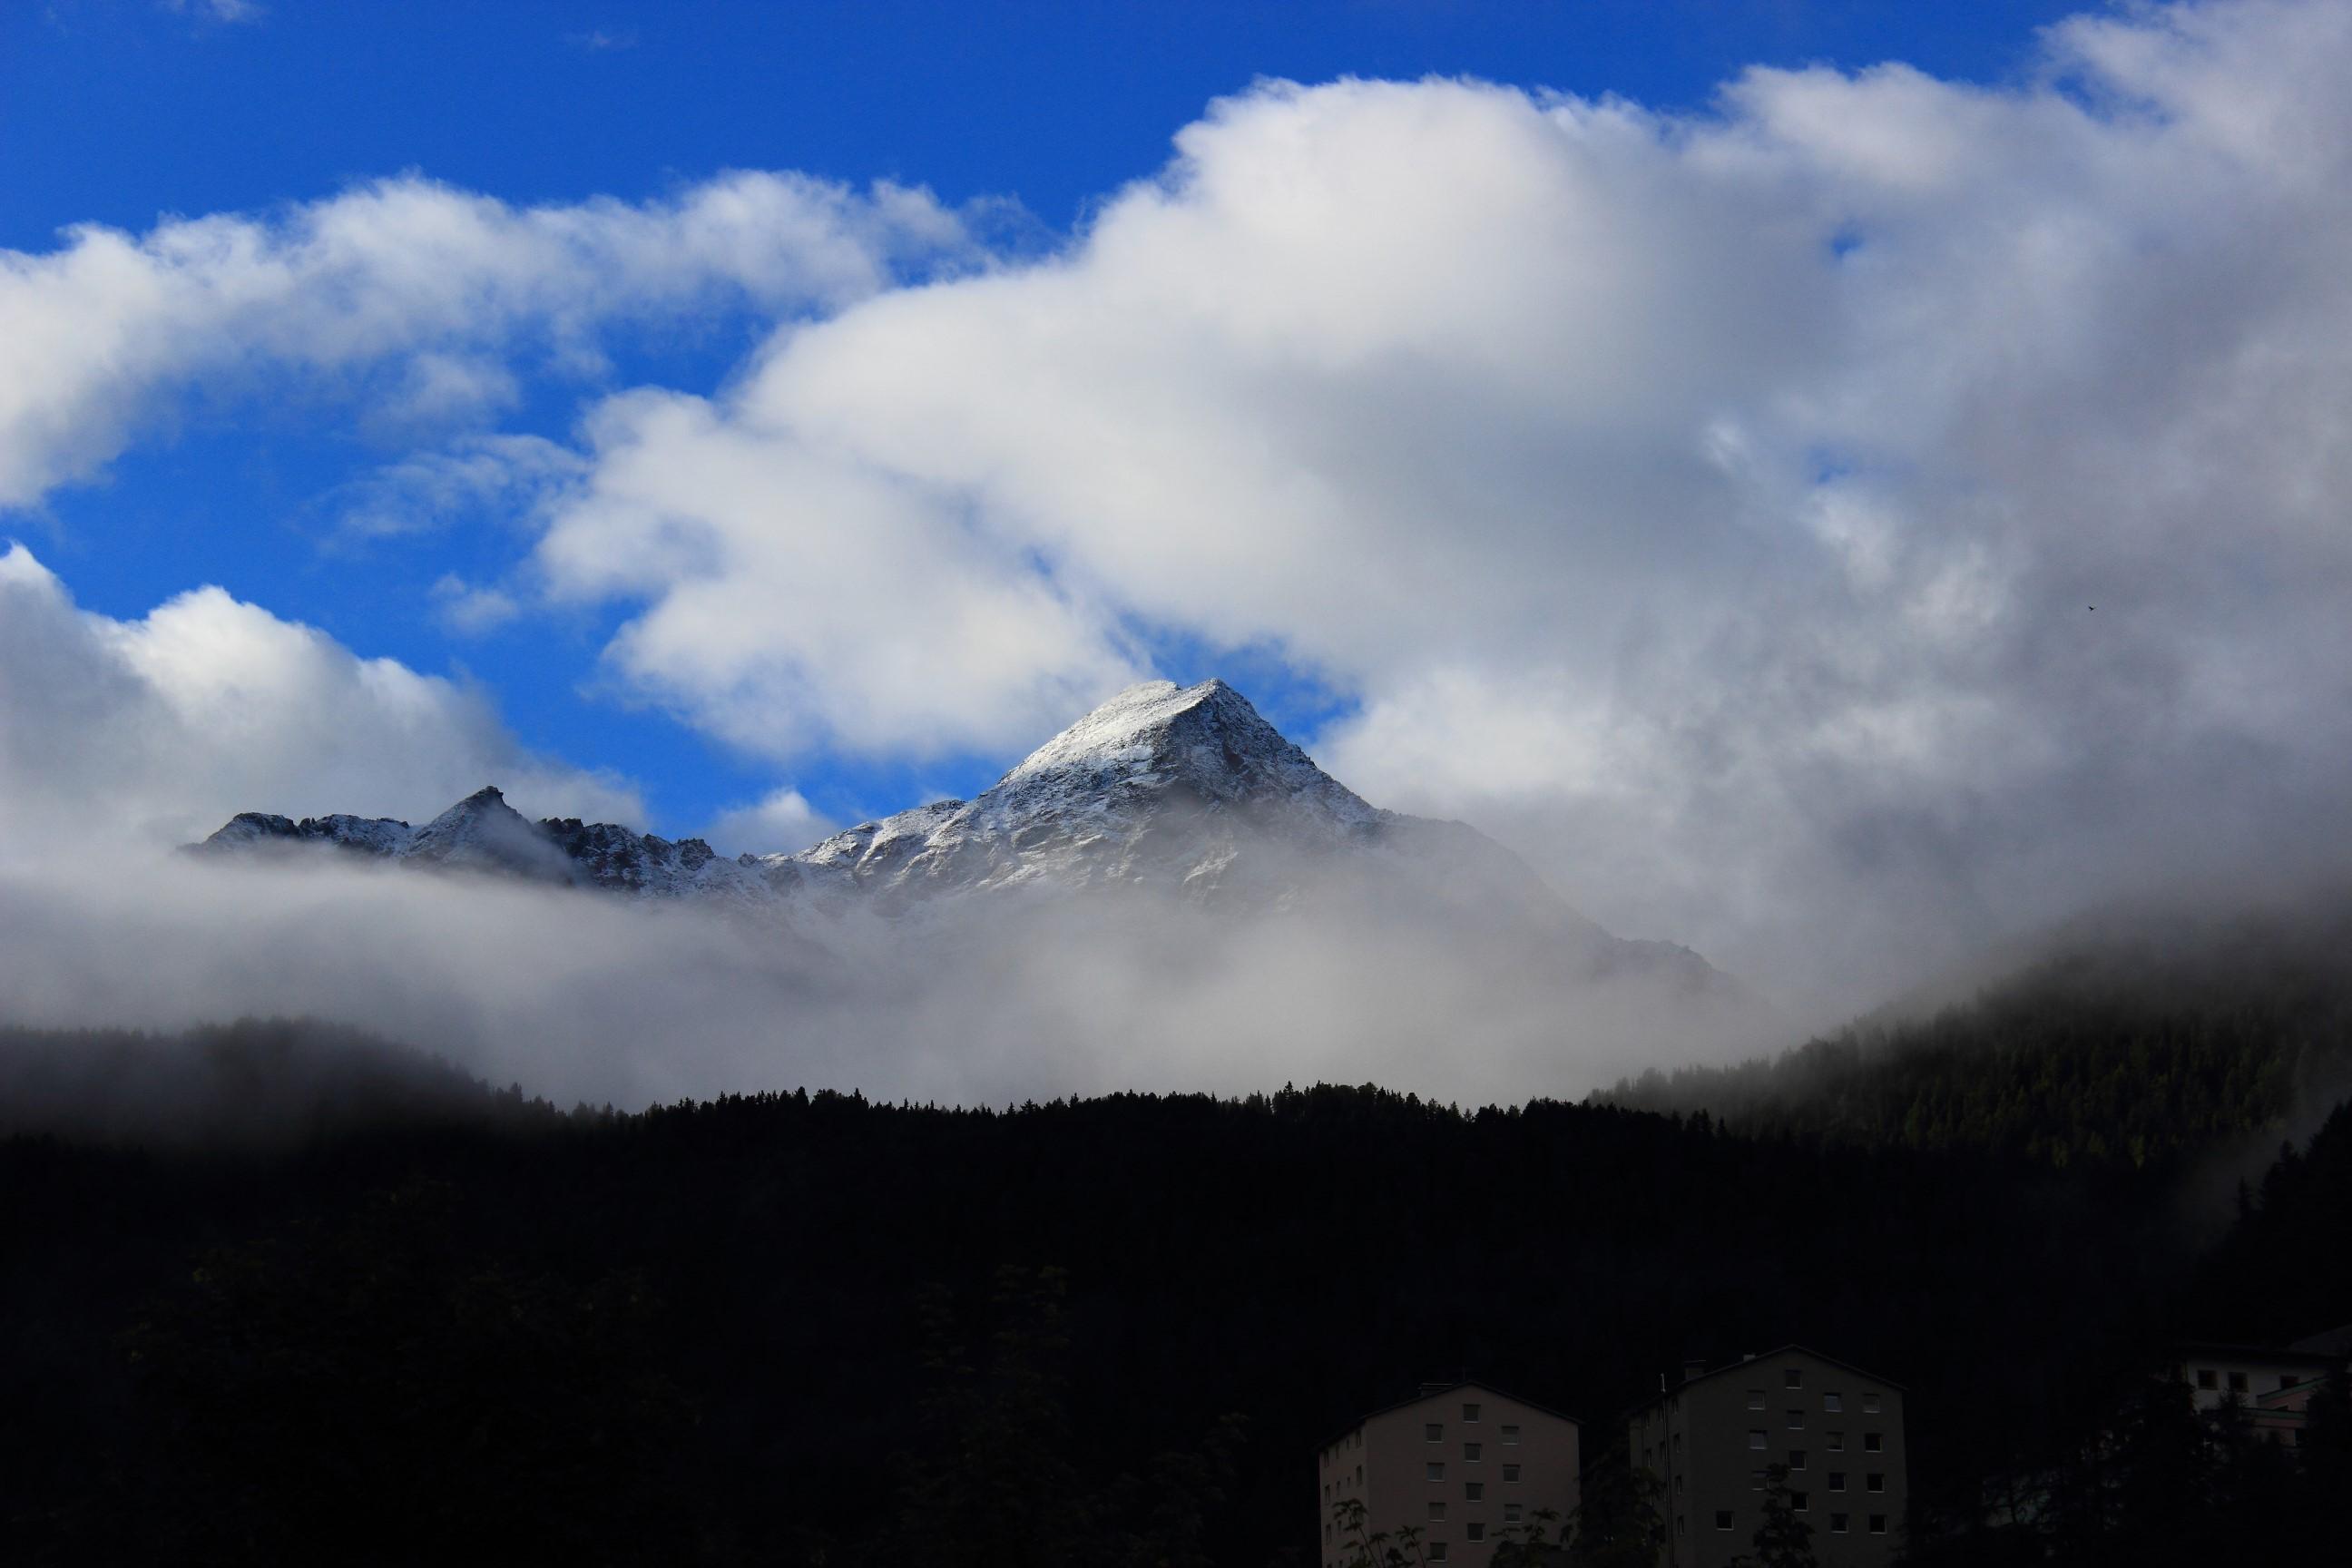 Solden - Alpy w chmurach